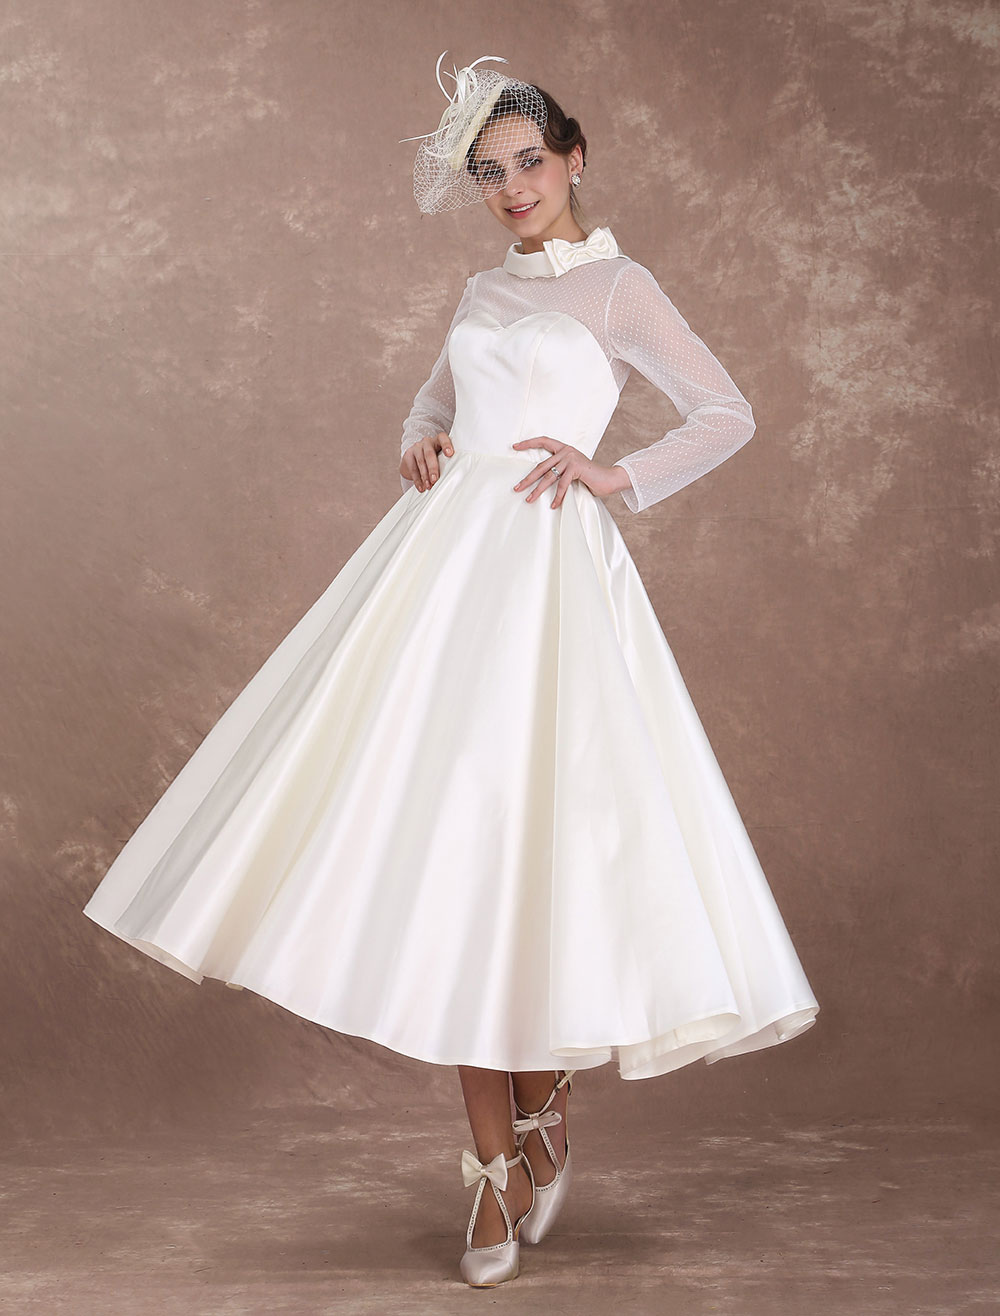 Short Wedding Dress with Sweetheart Neckline